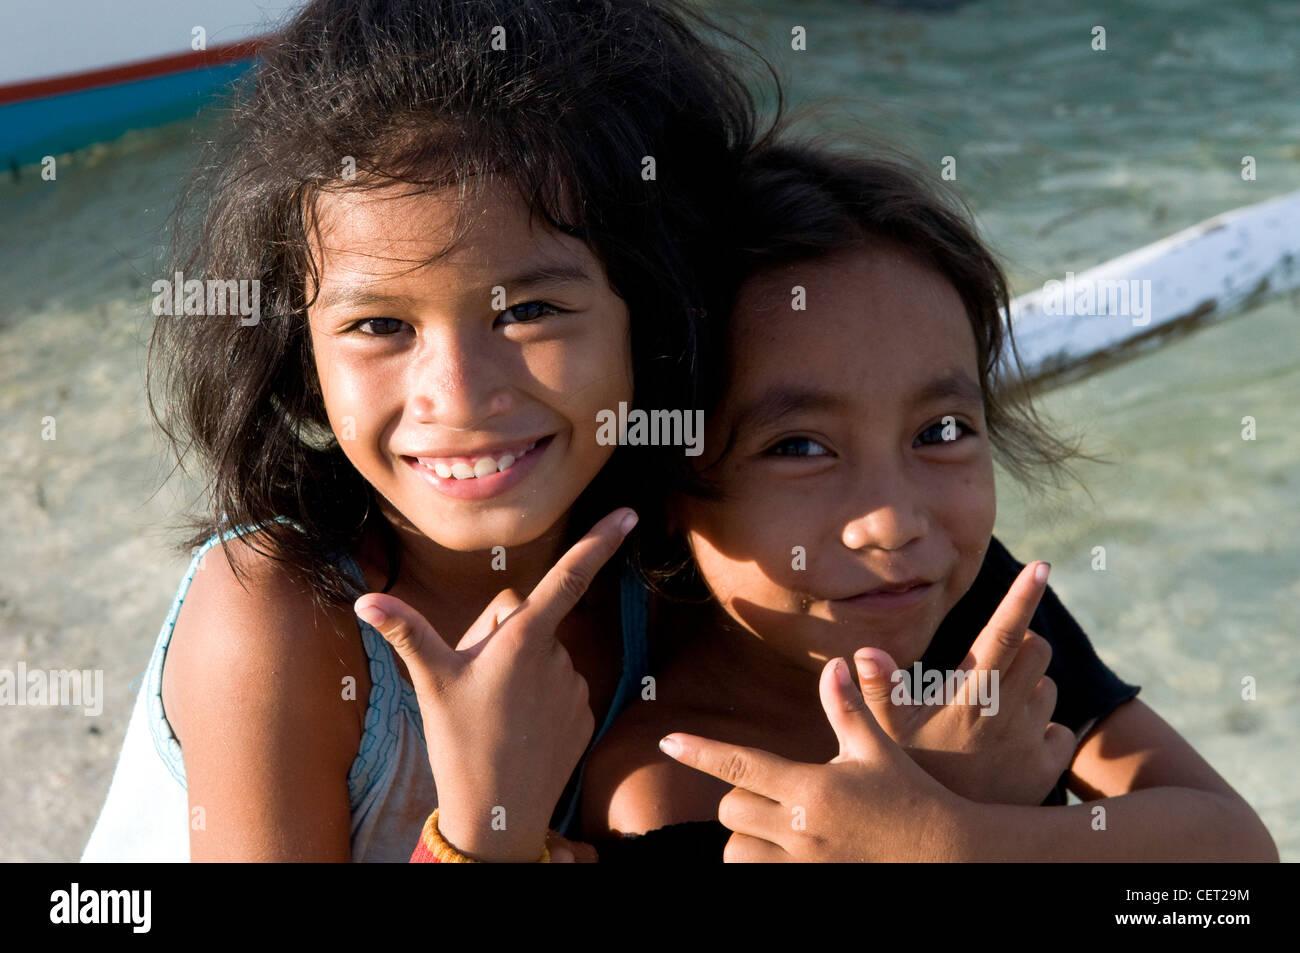 Cute filipino girls in cebu stock photo 43554608 alamy cute filipino girls in cebu thecheapjerseys Choice Image